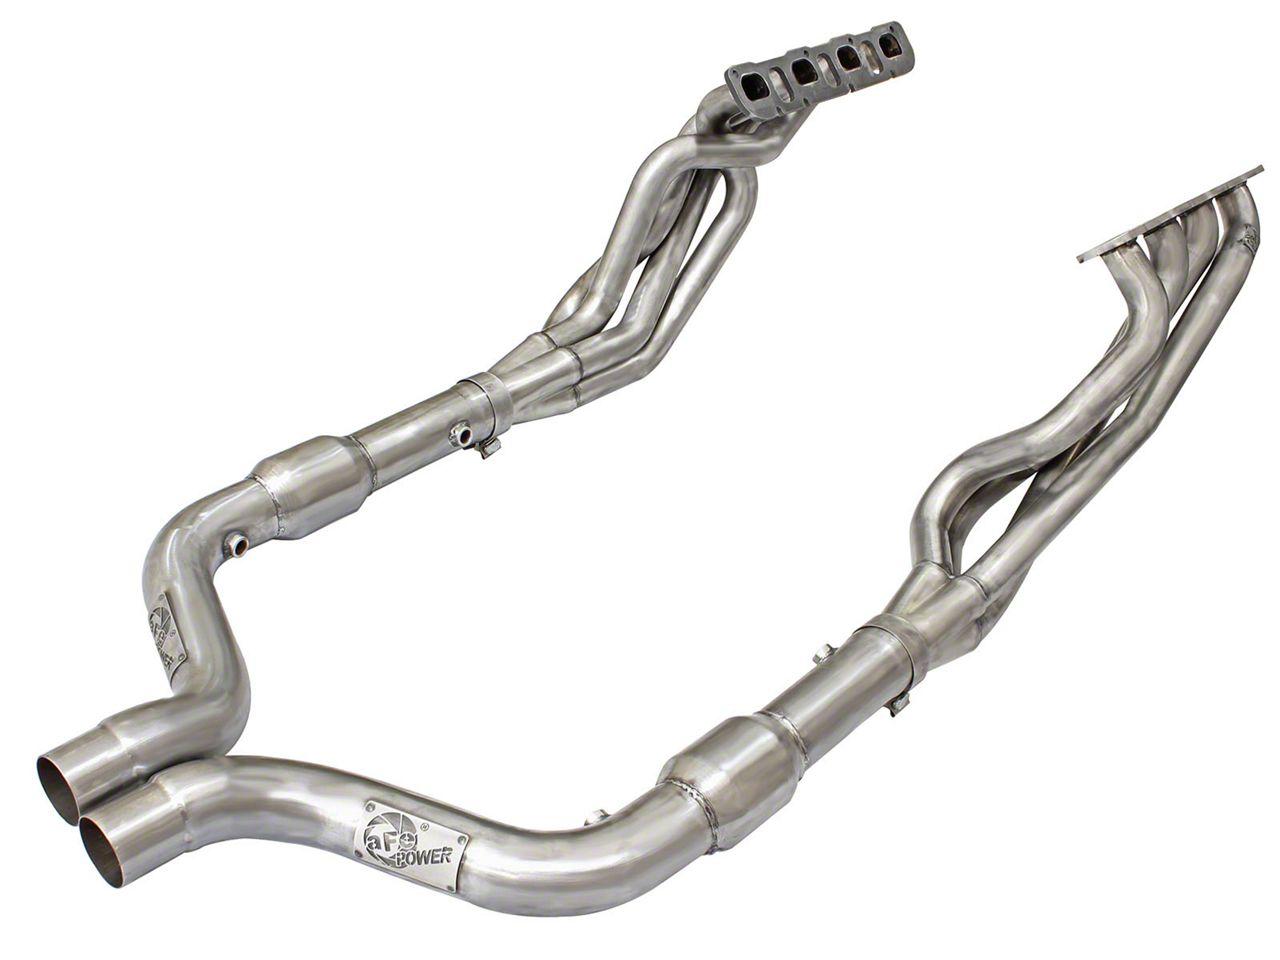 AFE 1-7/8 in. Twisted Steel Long Tube Headers & Catted Mid-Pipe - Street Series (15-18 6.2L HEMI, 6.4L HEMI)